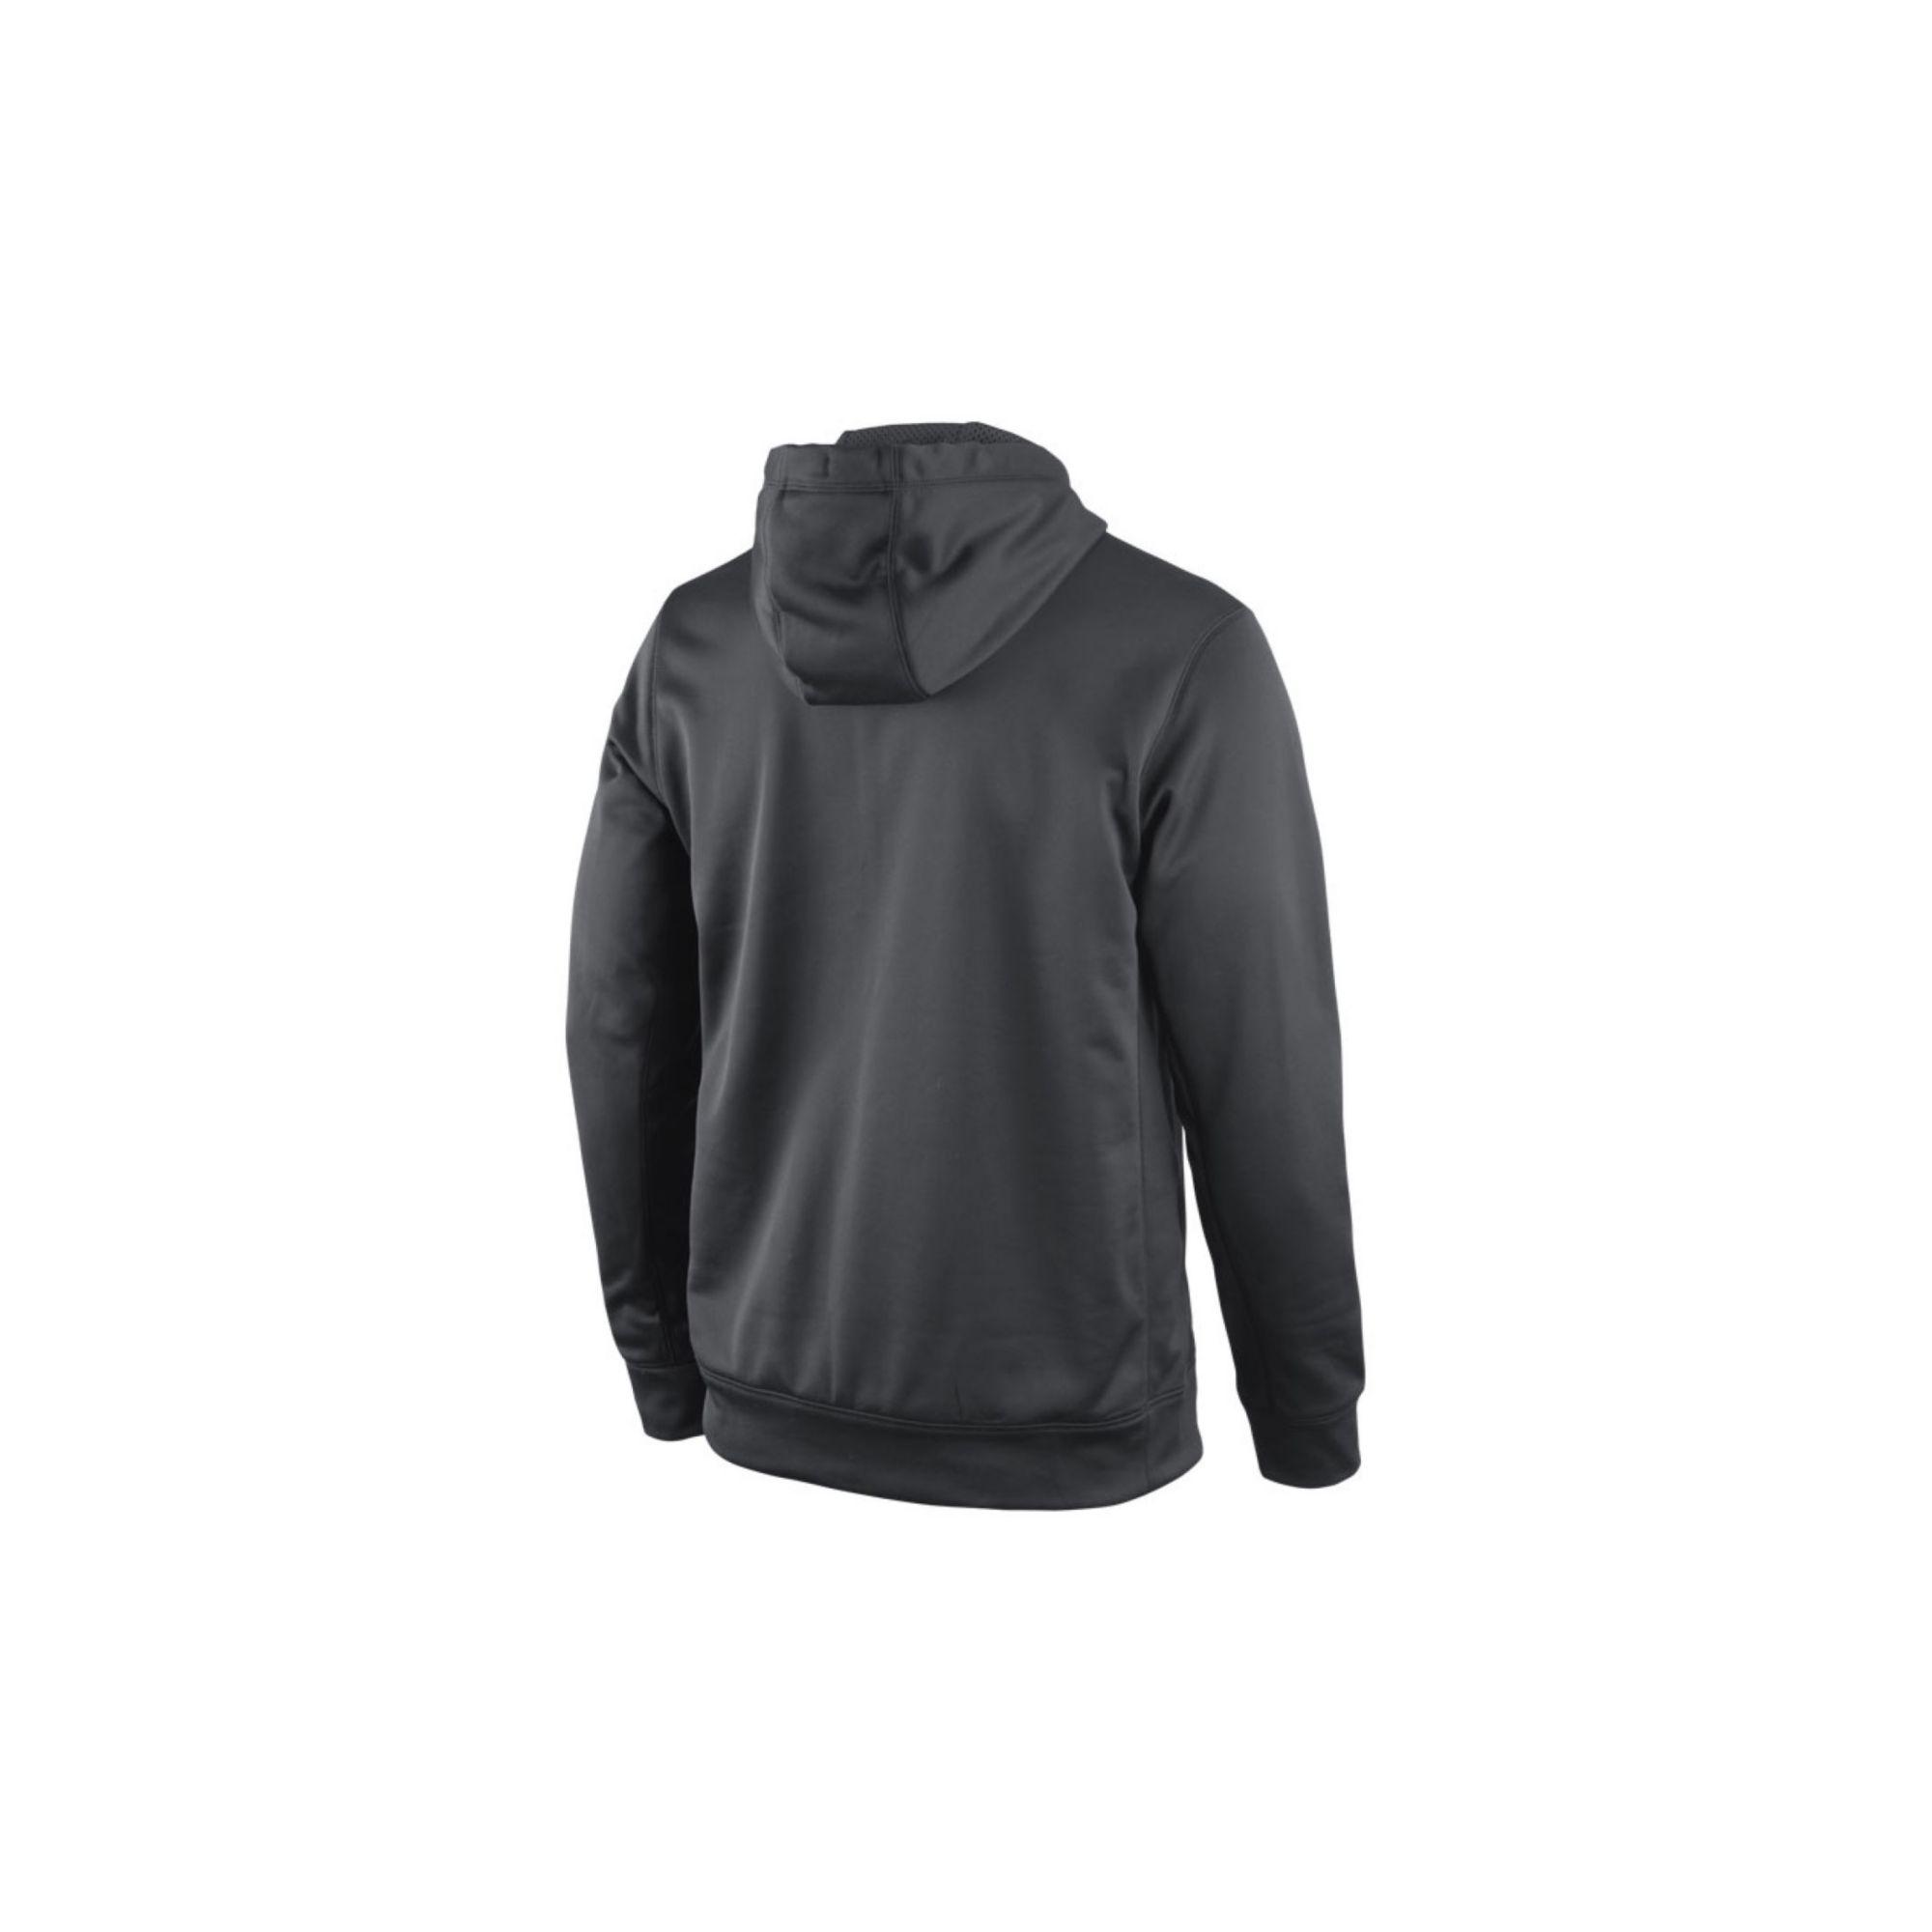 08bab503e0 Lyst - Nike Mens New England Patriots Platinum Ko Hoodie in Gray for Men